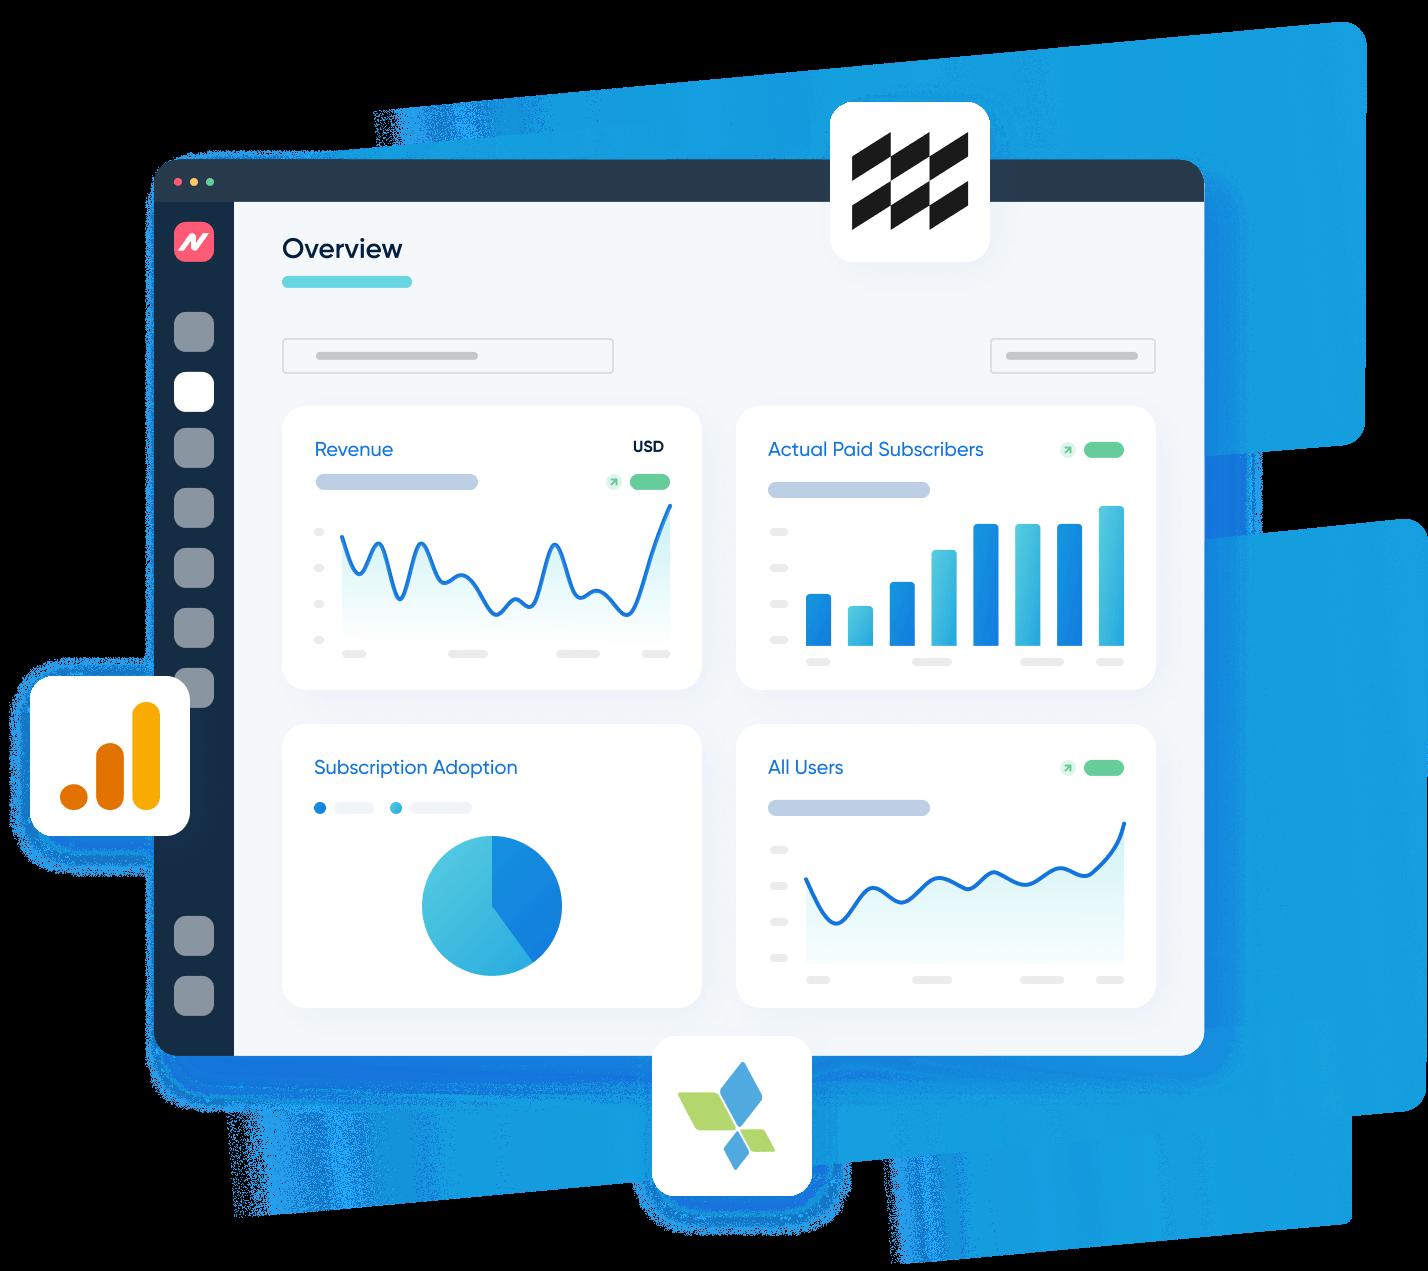 Measure data and analytics view